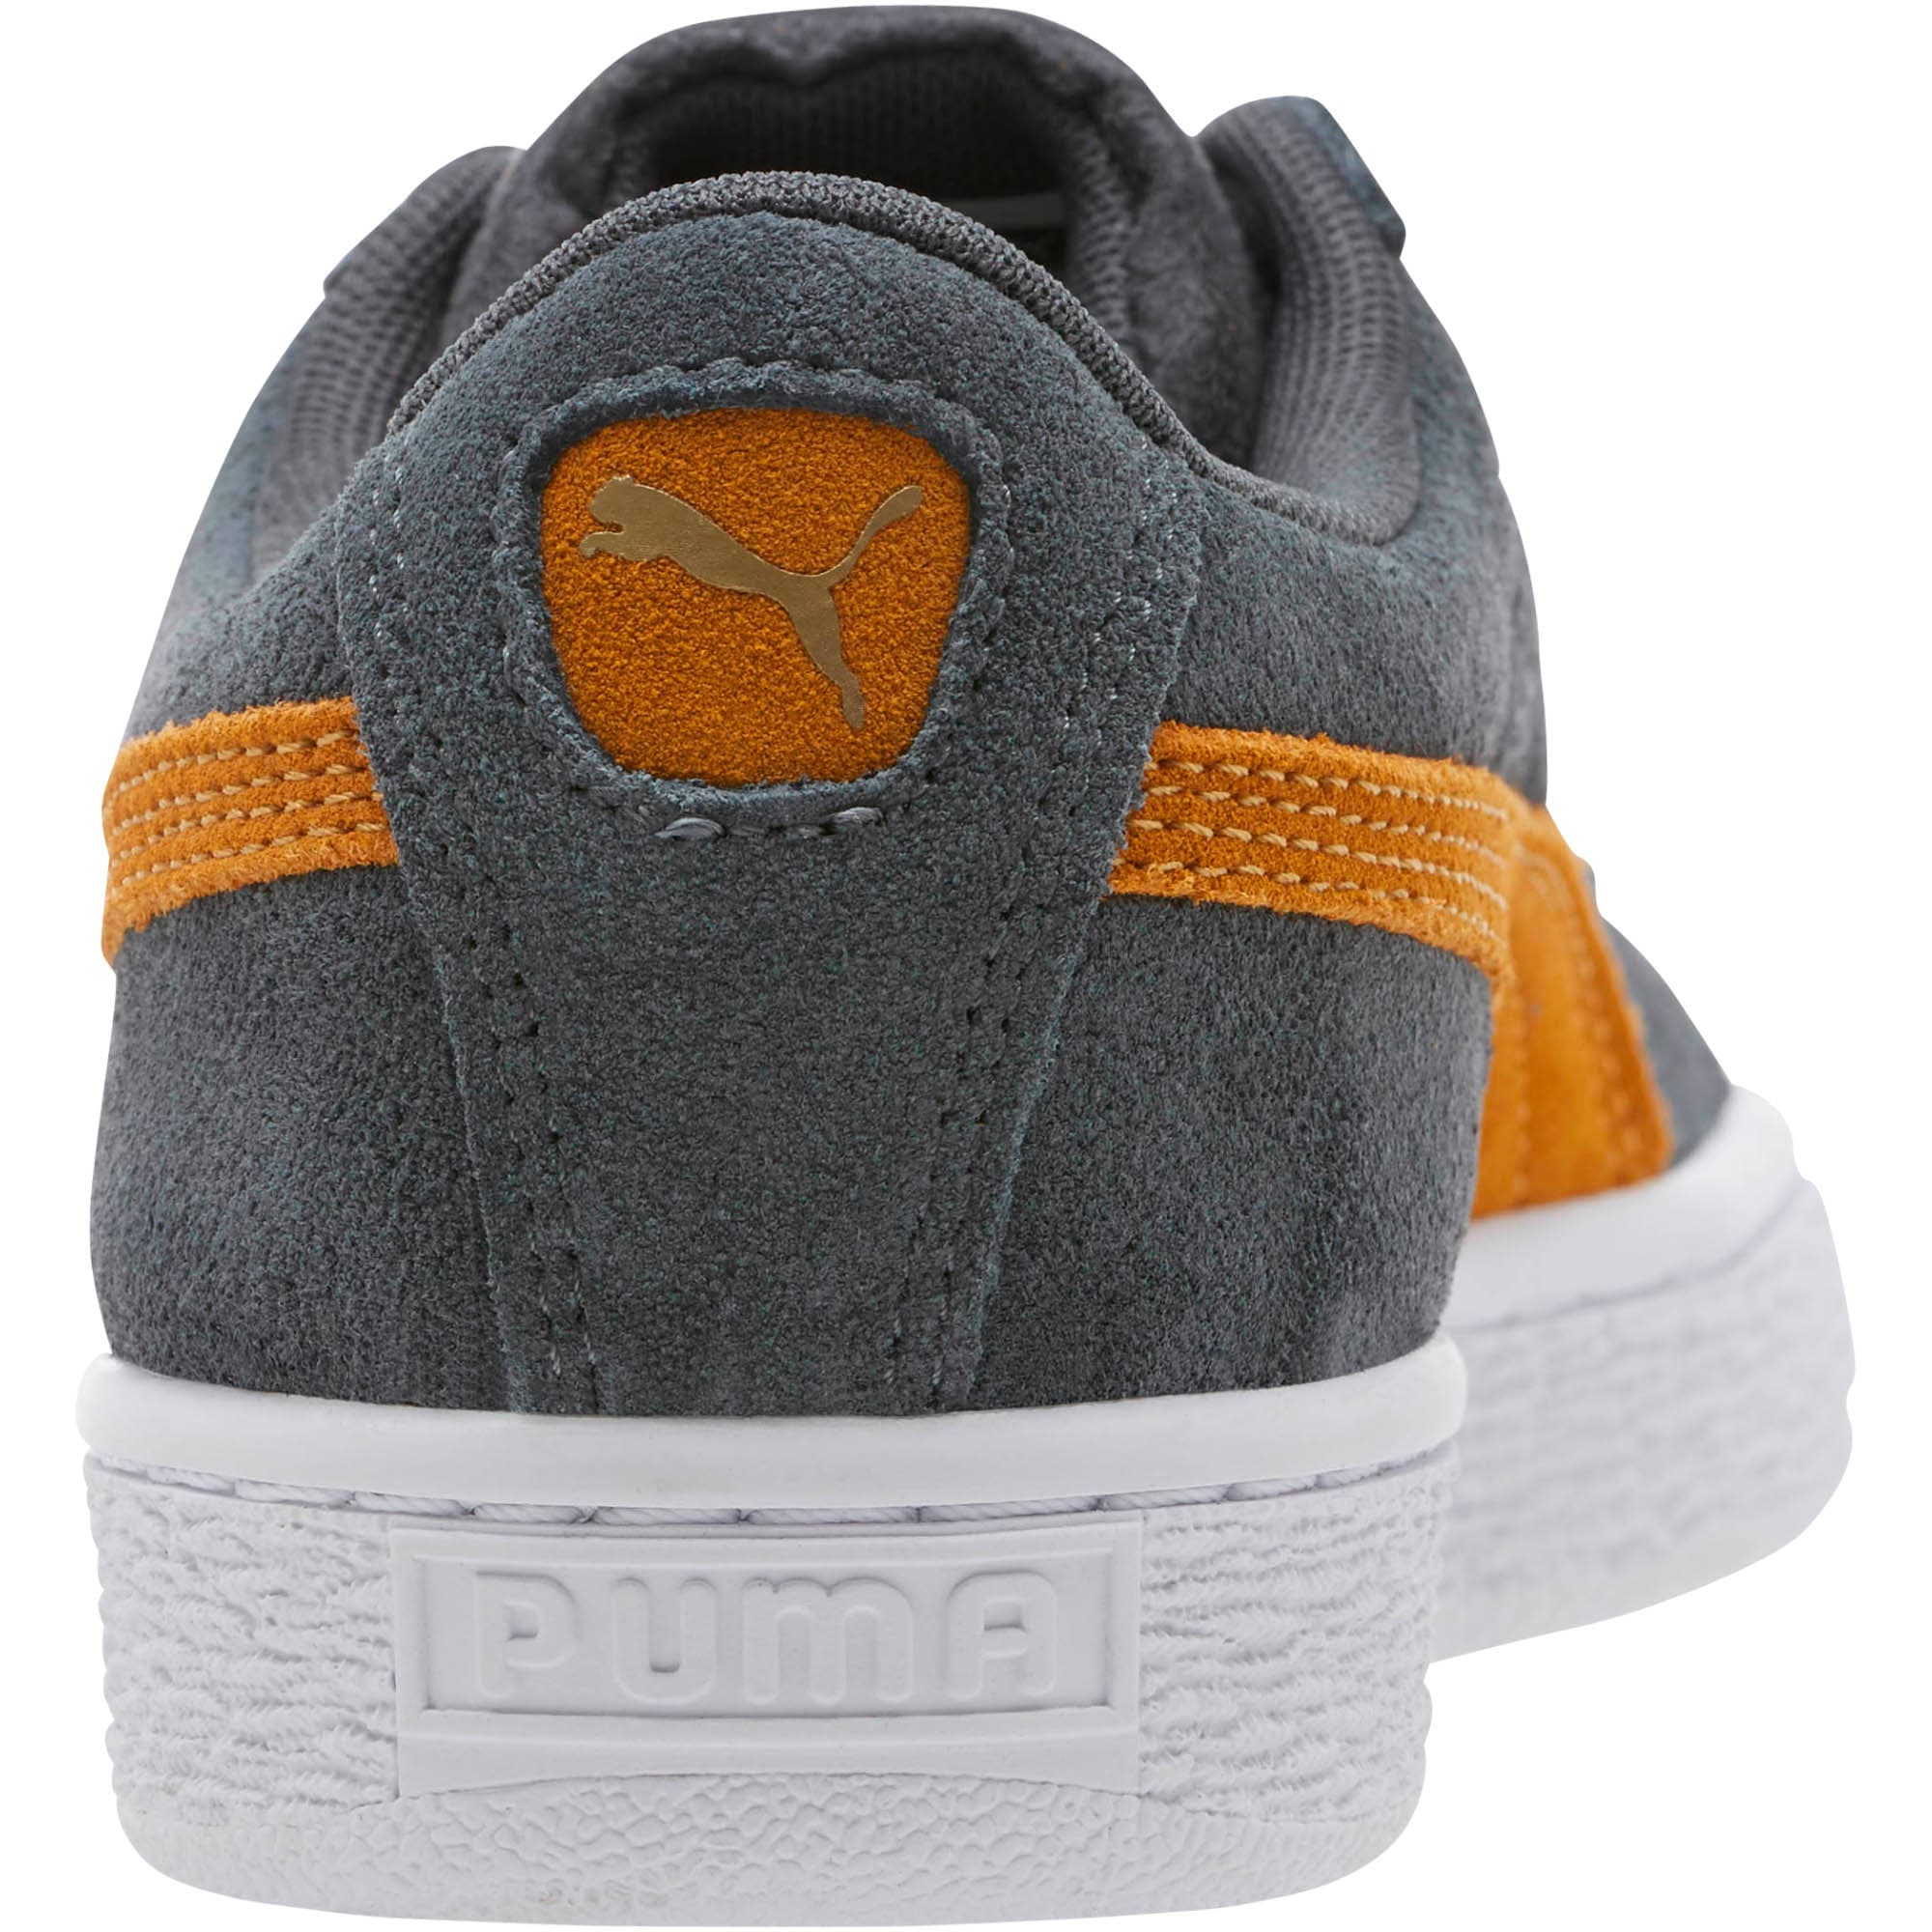 Thumbnail 4 of Suede Classic Sneakers JR, Iron Gate-Buckthorn, medium